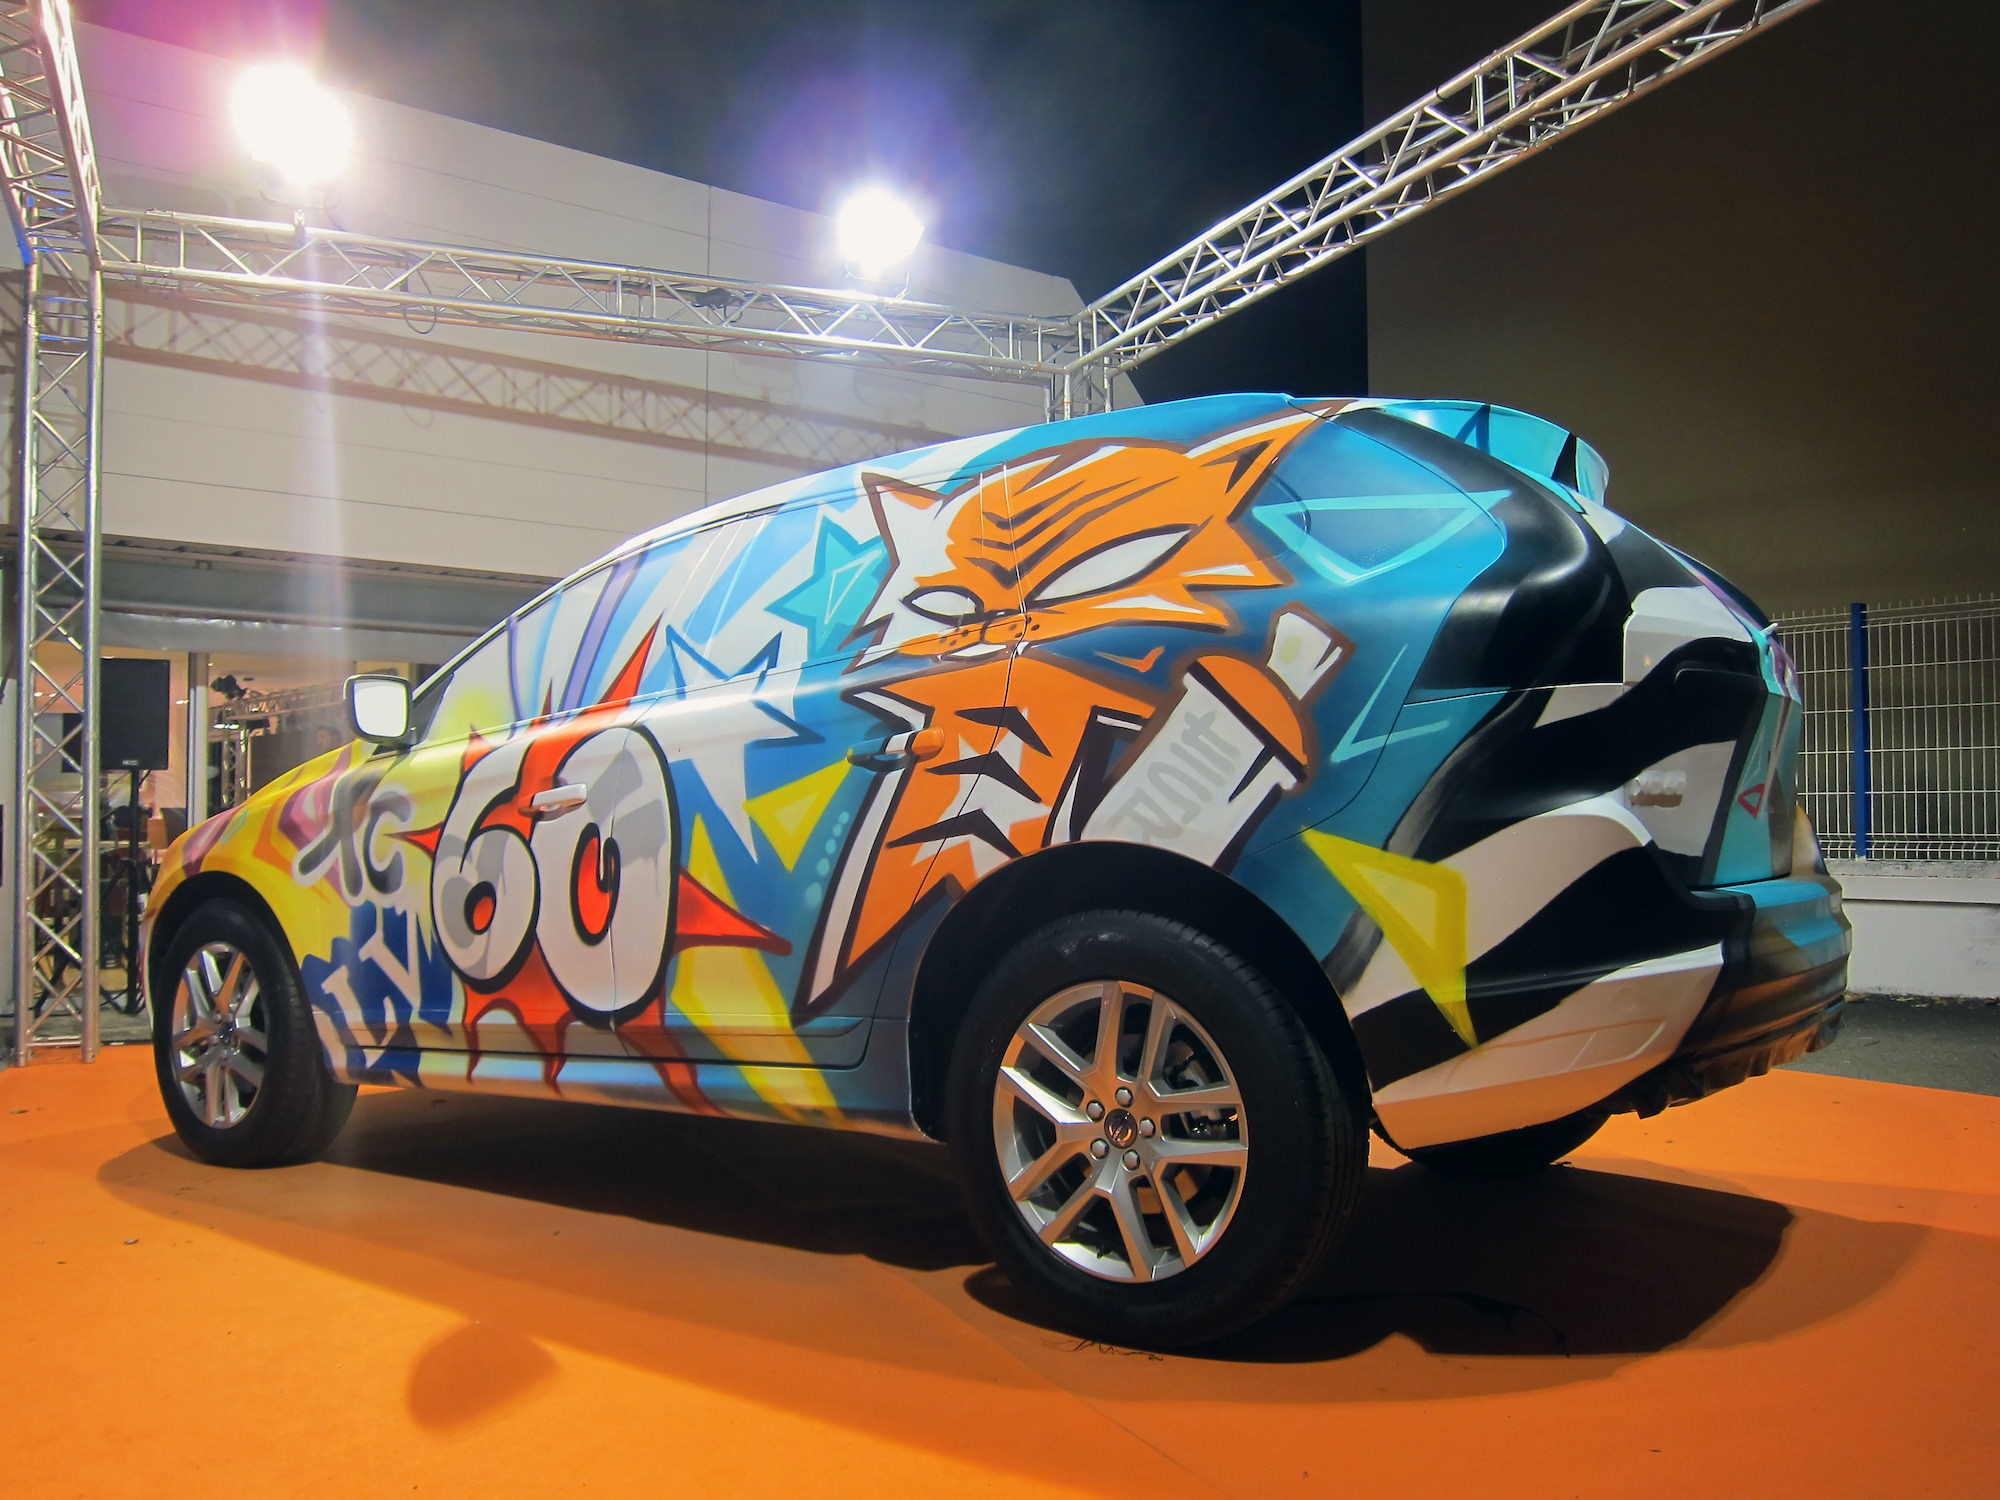 xc60-graffiti-pau-graffeur-artiste-voiture-custom